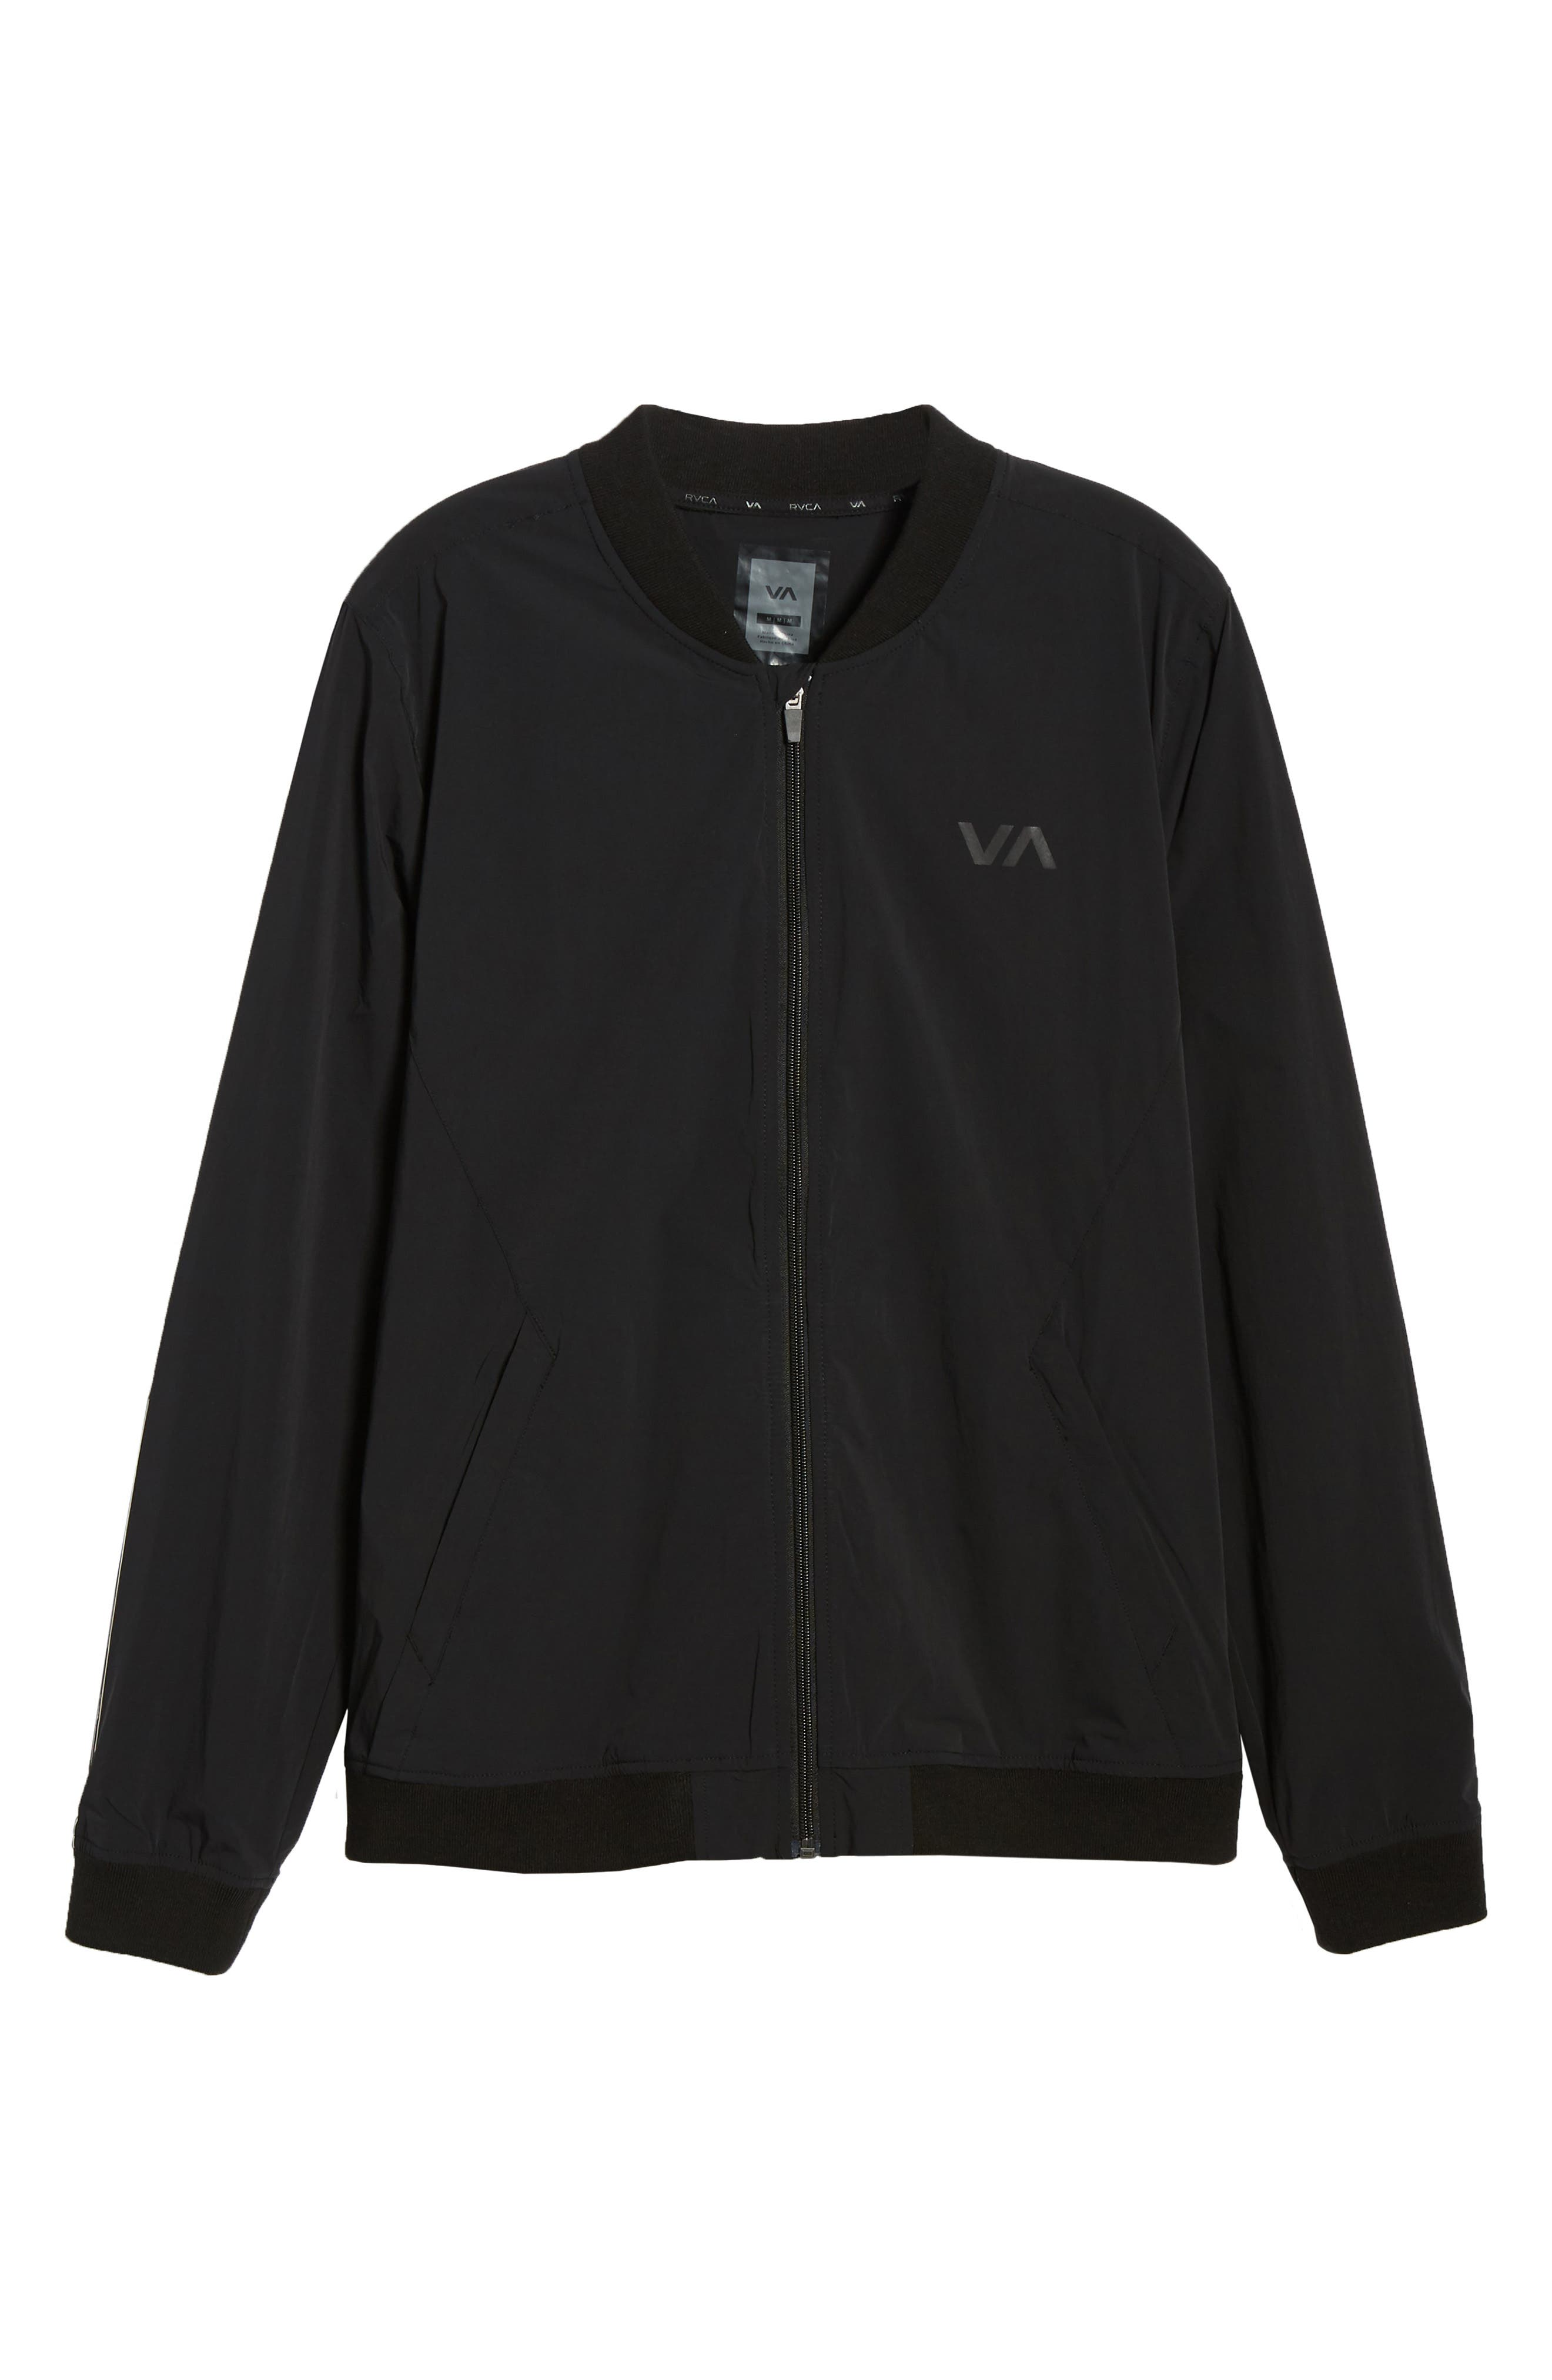 RVCA, VA Resin Bomber Jacket, Alternate thumbnail 2, color, BLACK